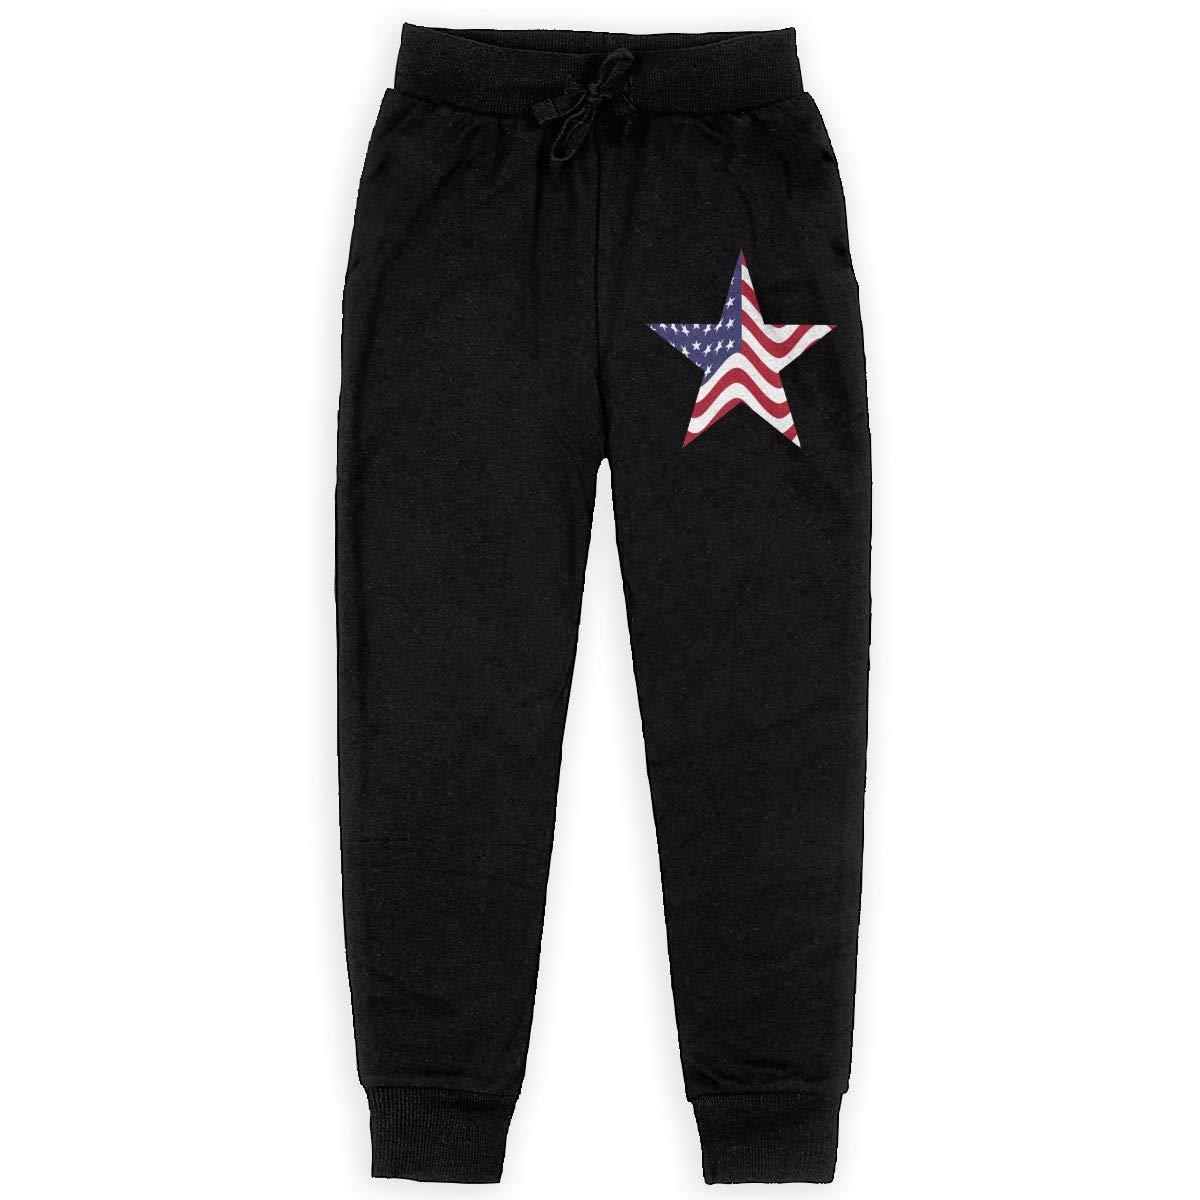 IufnNRJndfu America Star Boys Athletic Smart Fleece Pant Youth Soft and Cozy Sweatpants